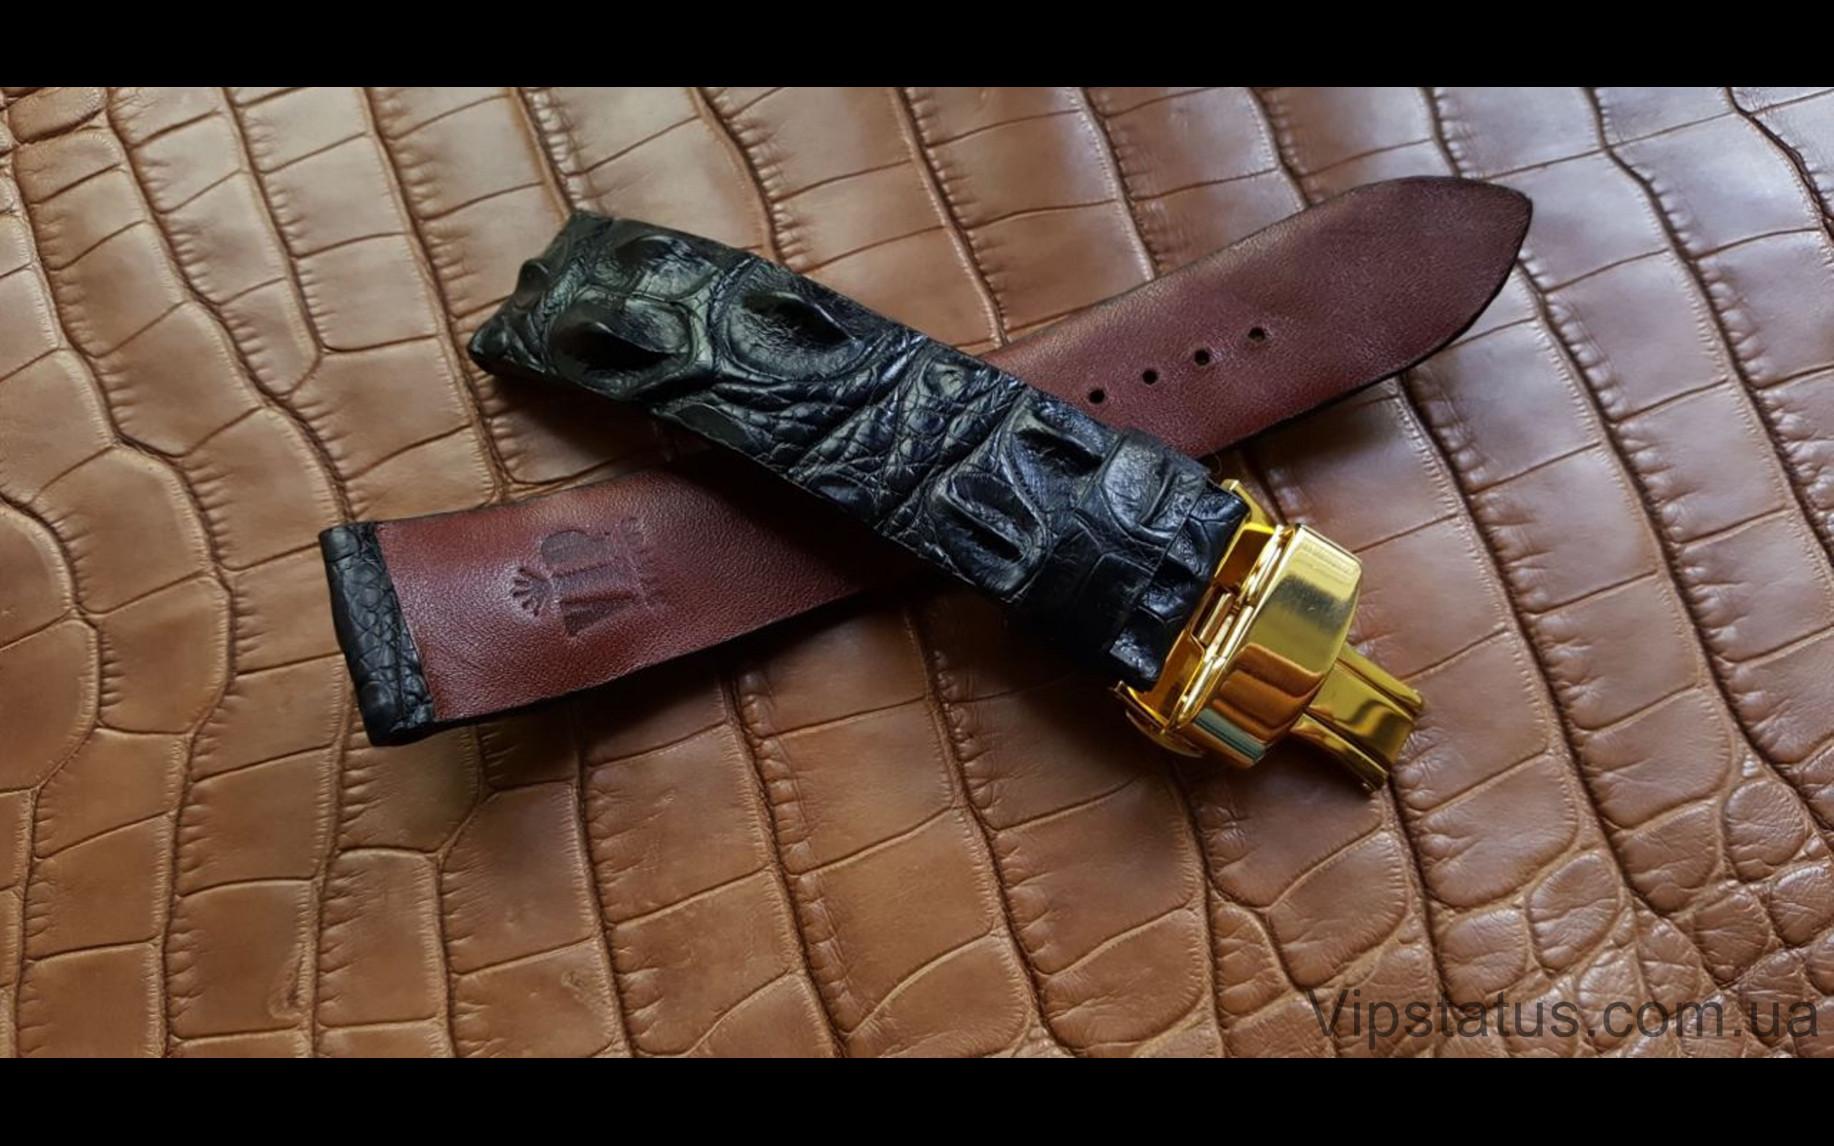 Elite Эксклюзивный ремешок для часов Carl F. Bucherer кожа крокодила Exclusive Crocodile Strap for Carl F. Bucherer watches image 2